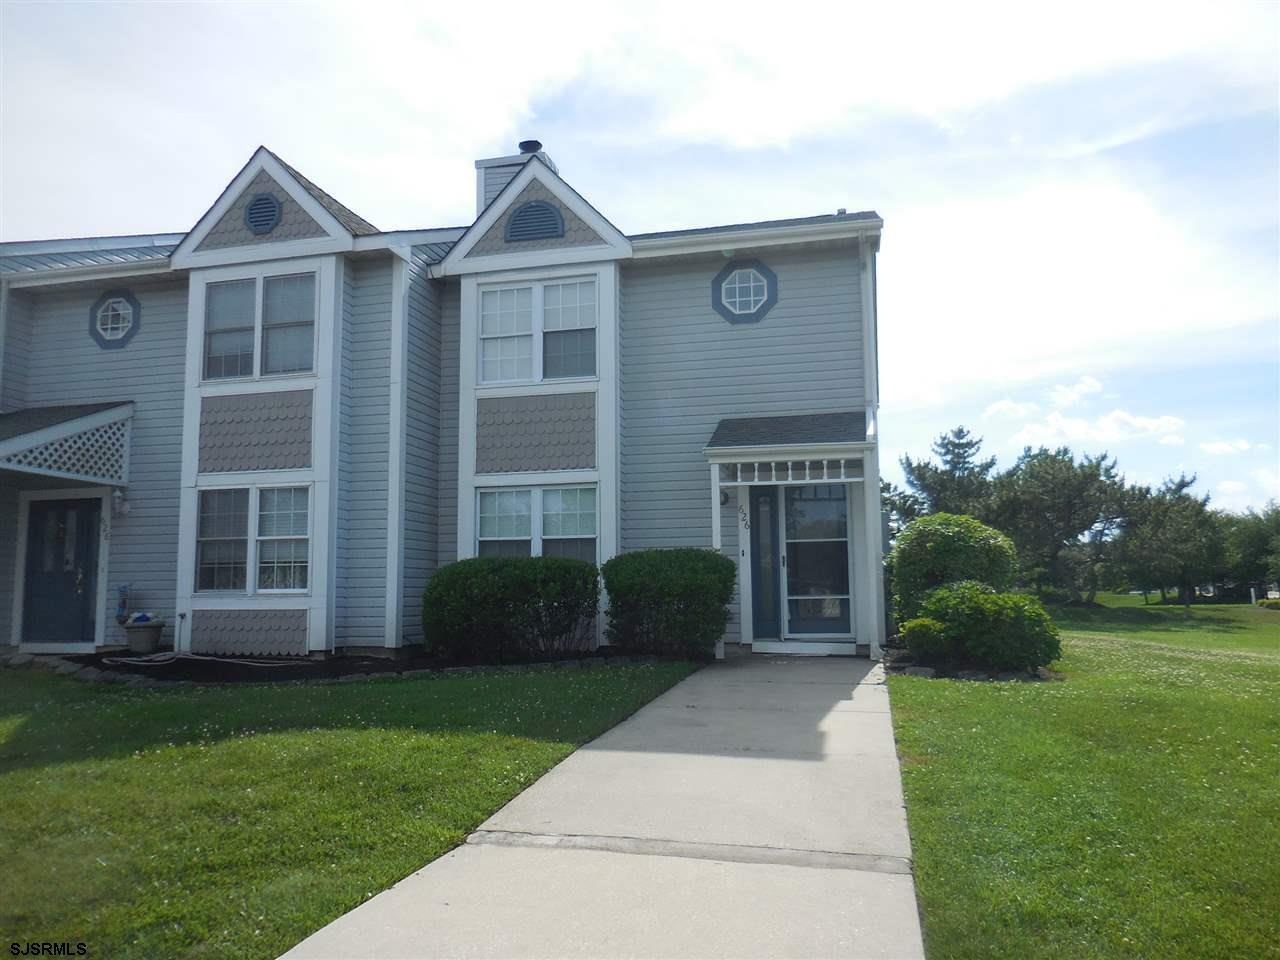 626 E Chancery Ln, Galloway Township, NJ 08205